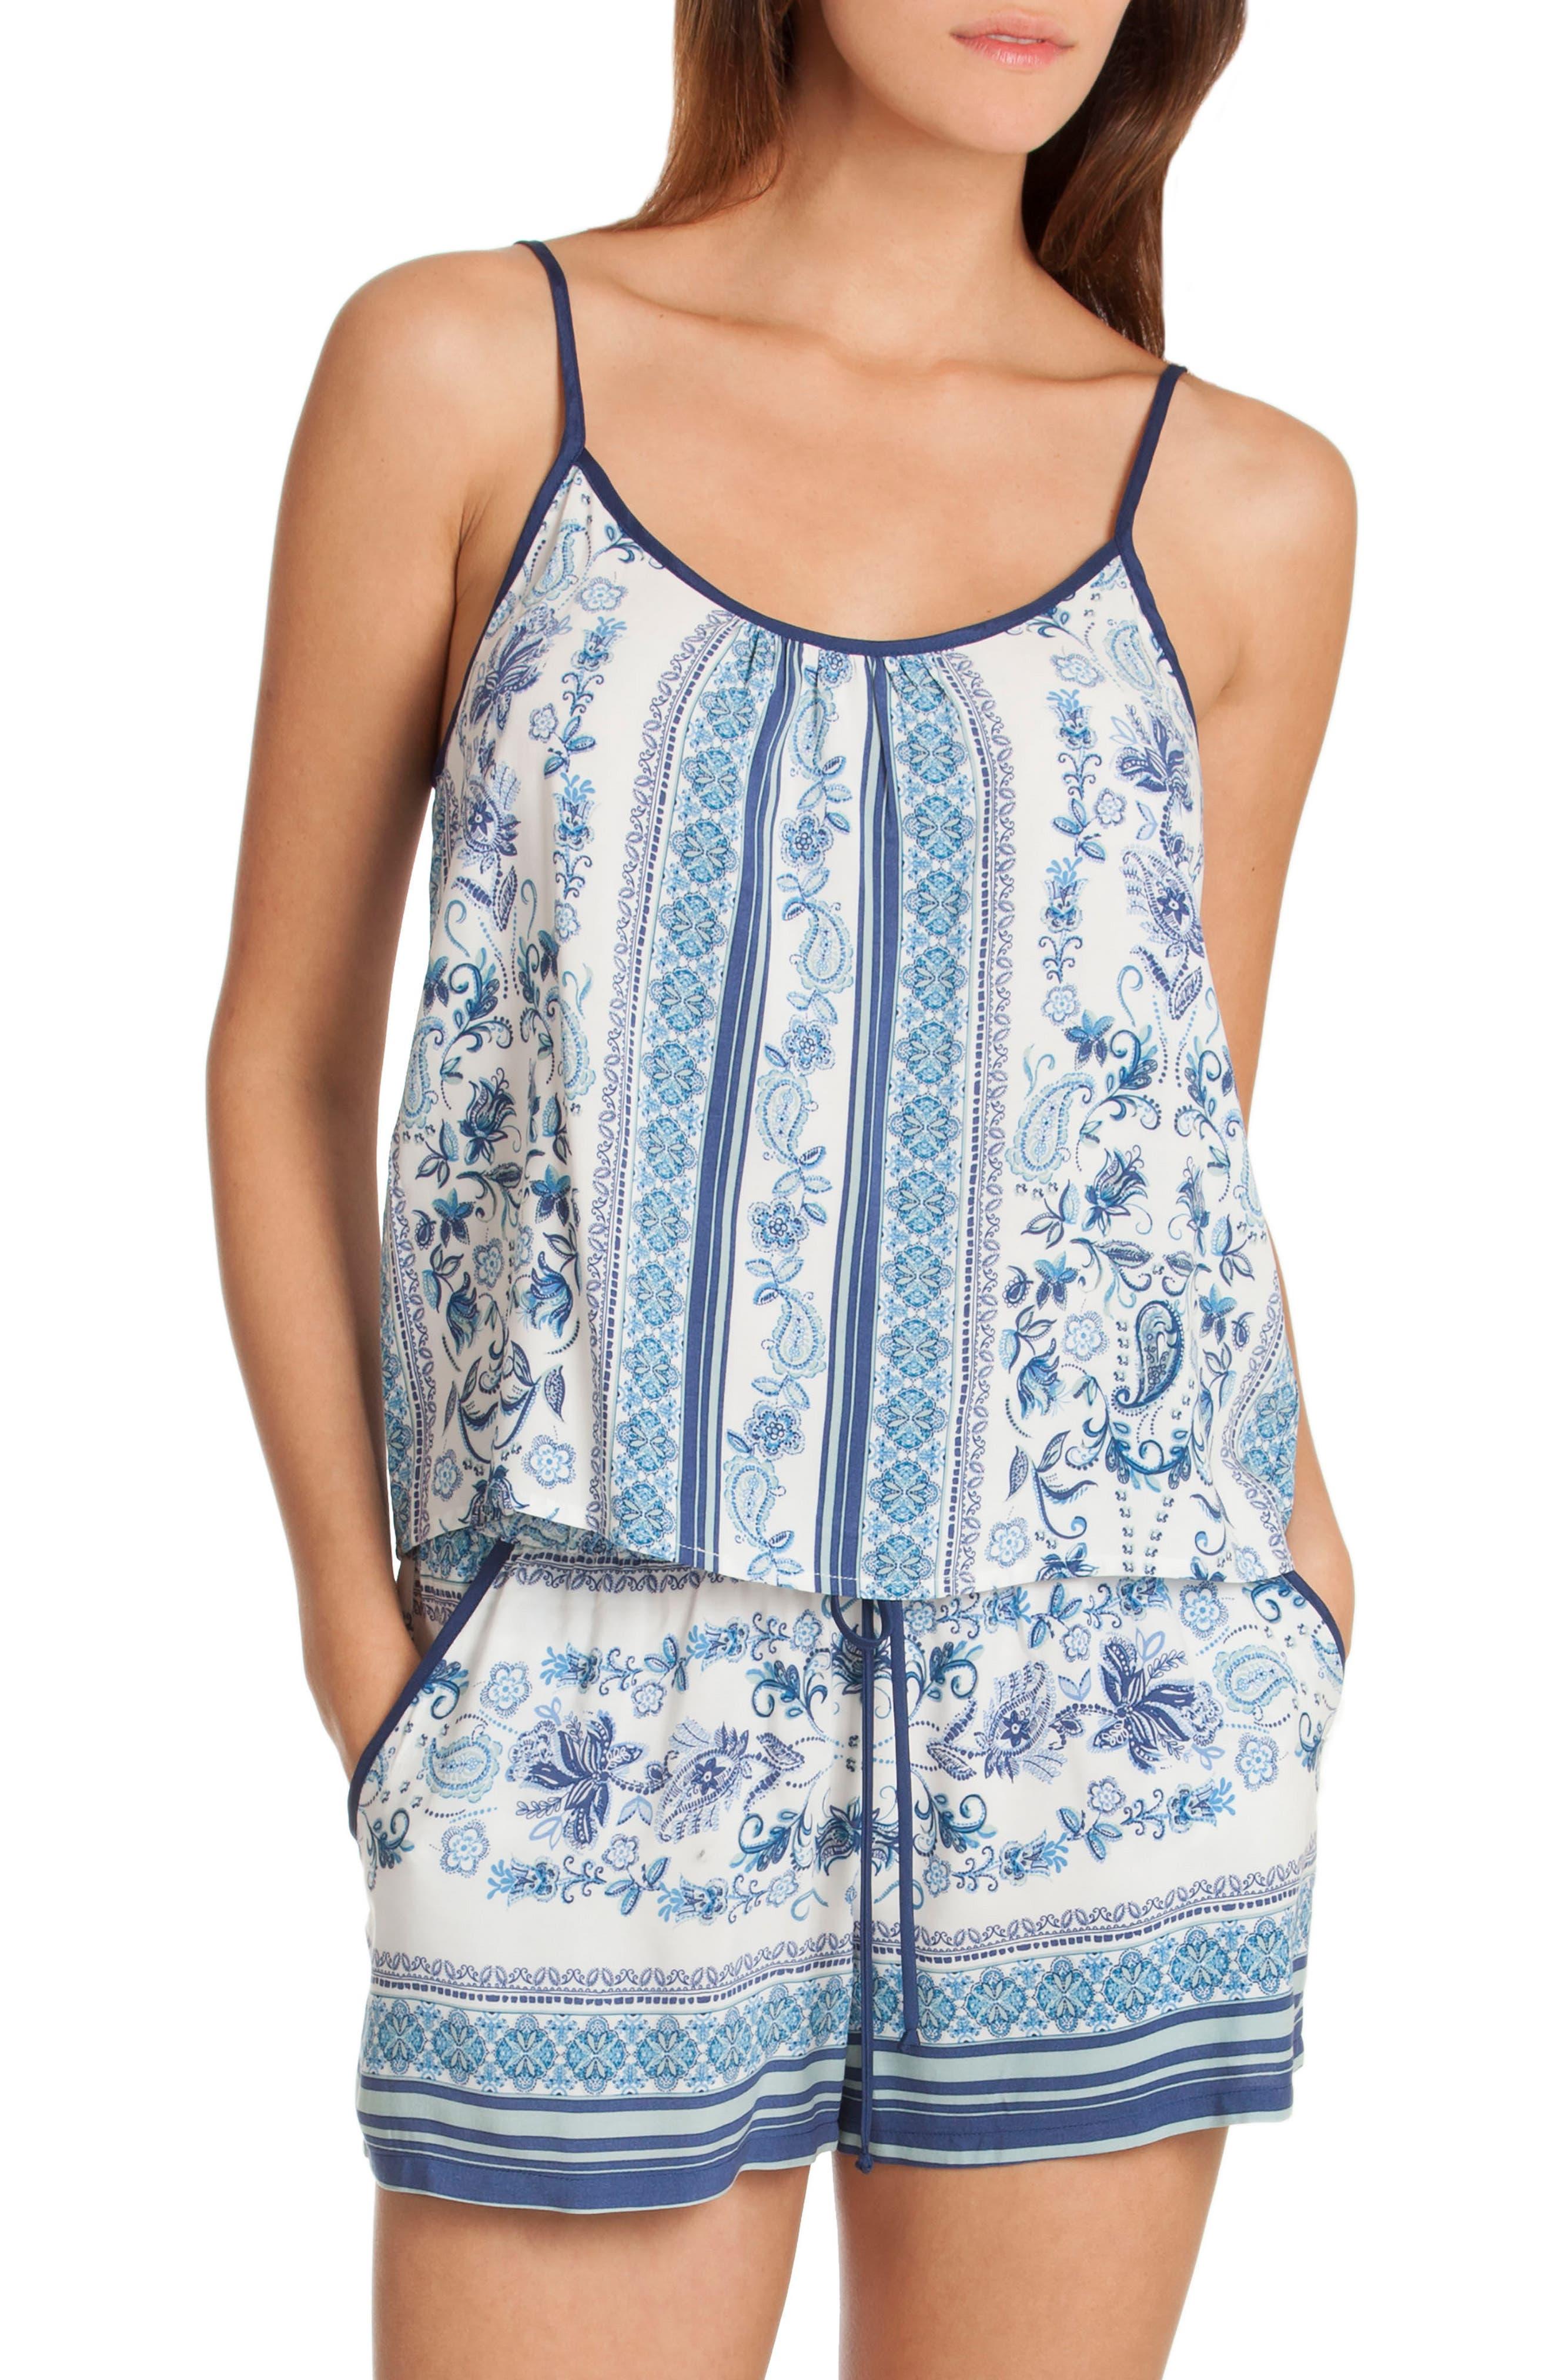 Short Pajamas,                         Main,                         color, Blue/ White Print